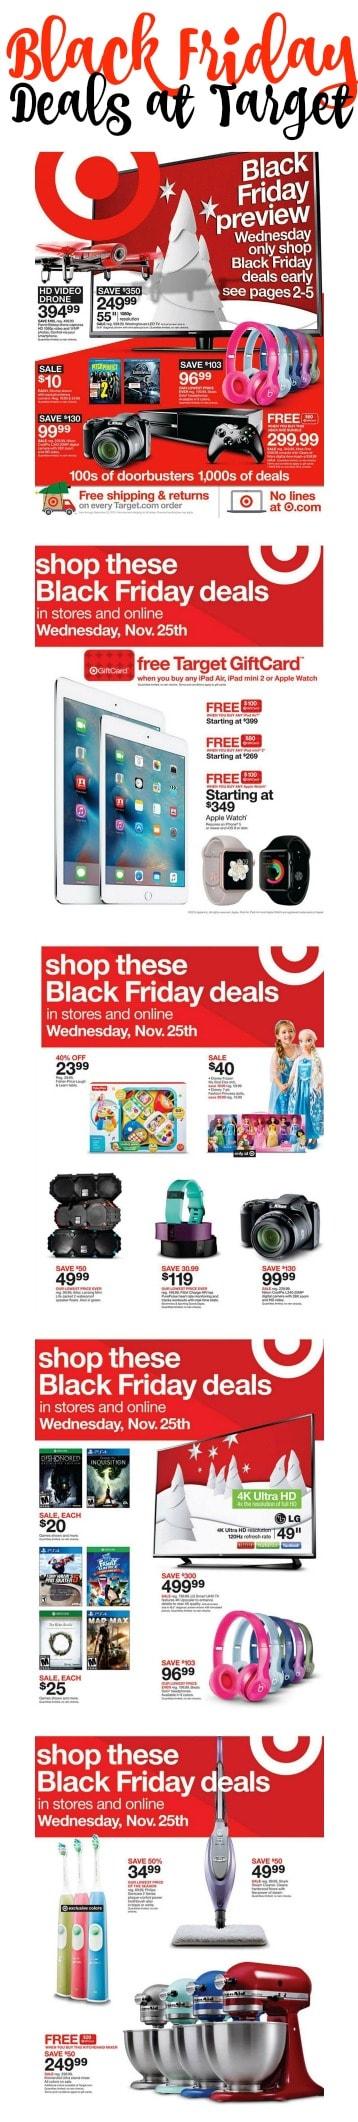 Black Friday Deals at Target 2015